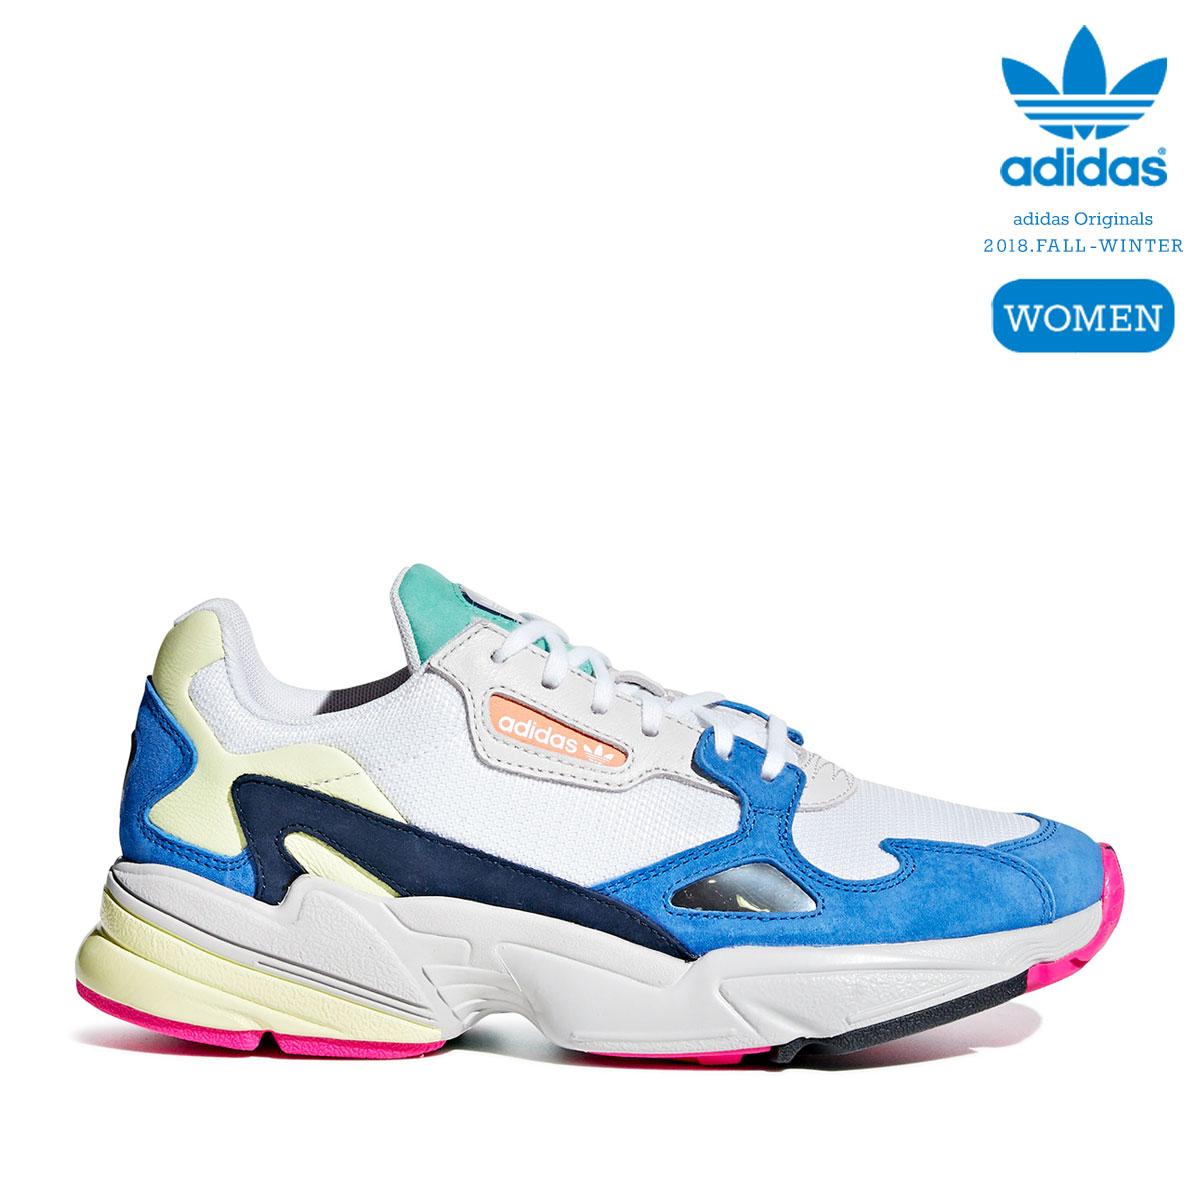 df91aa44719257 Kinetics  adidas Originals ADIDASFALCON W (Running White Running ...